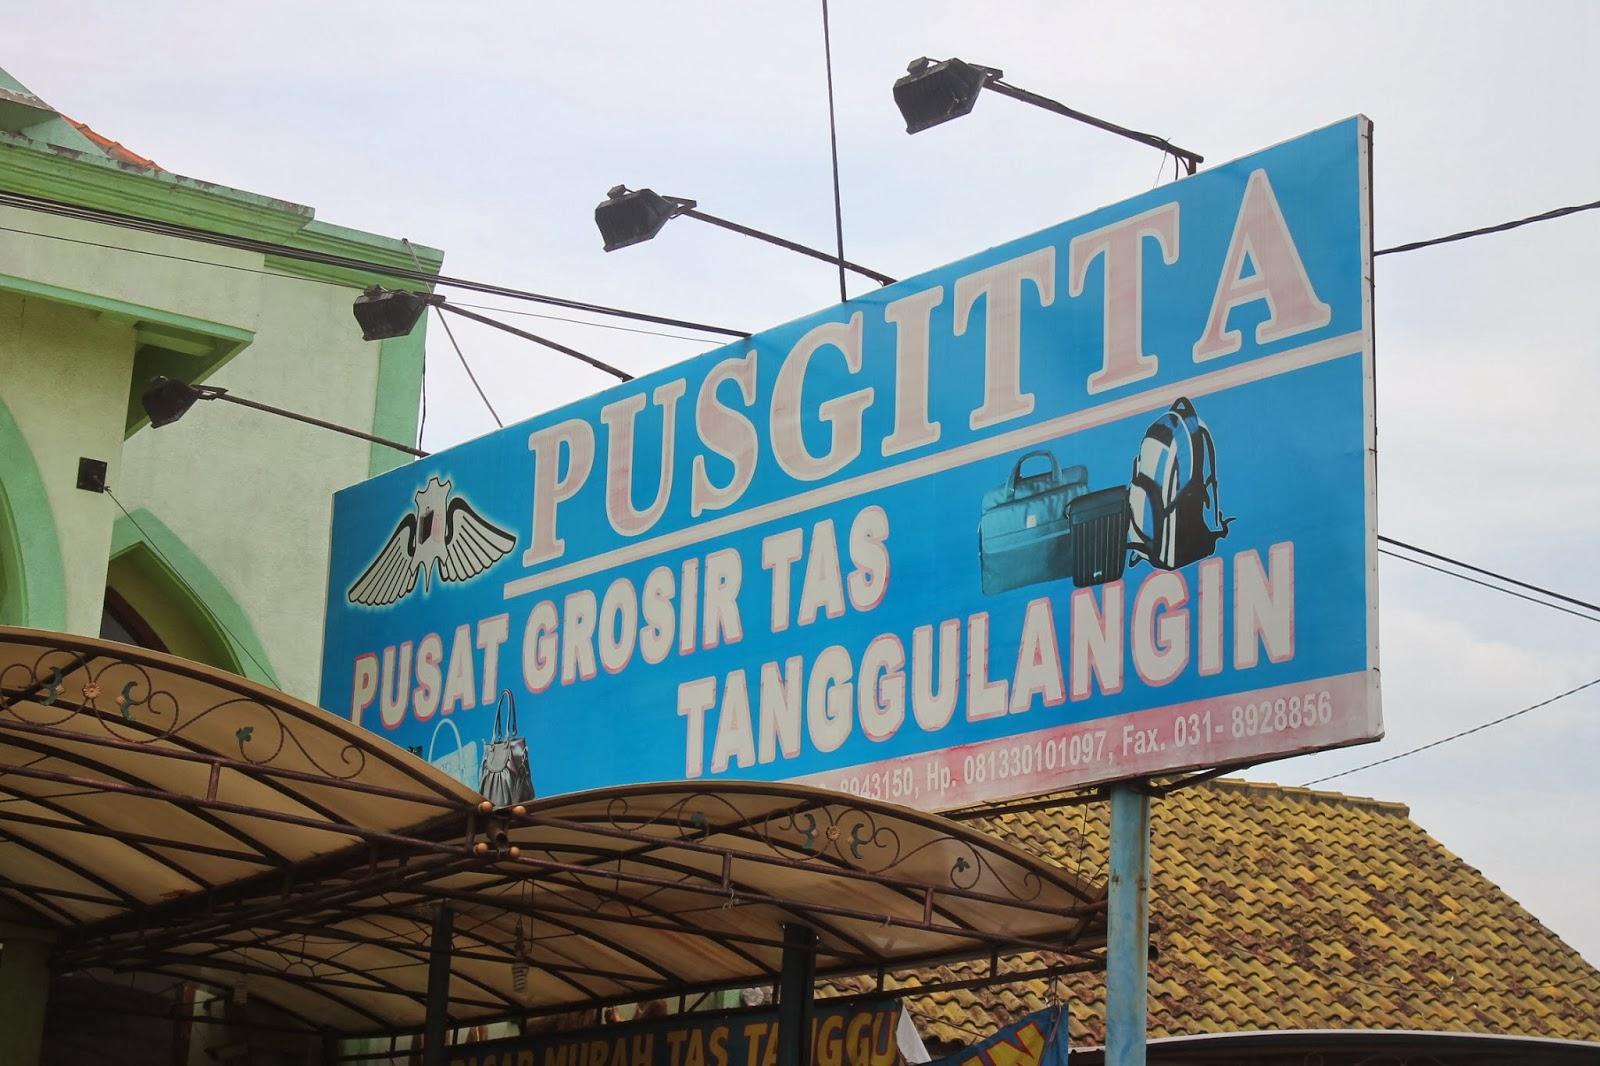 Pusgita Desa Kludan Kecamatan Tanggulangin Sidoarjo Sentra Industry Tas Kulit